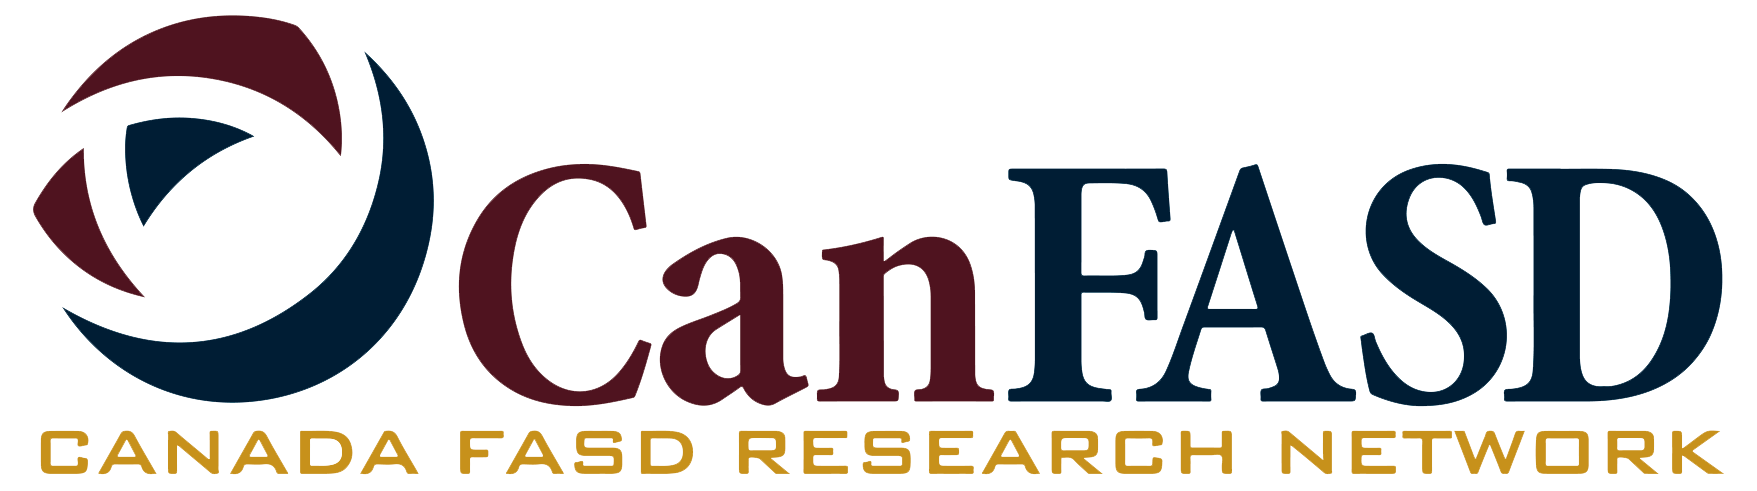 Canada FASD Research Network